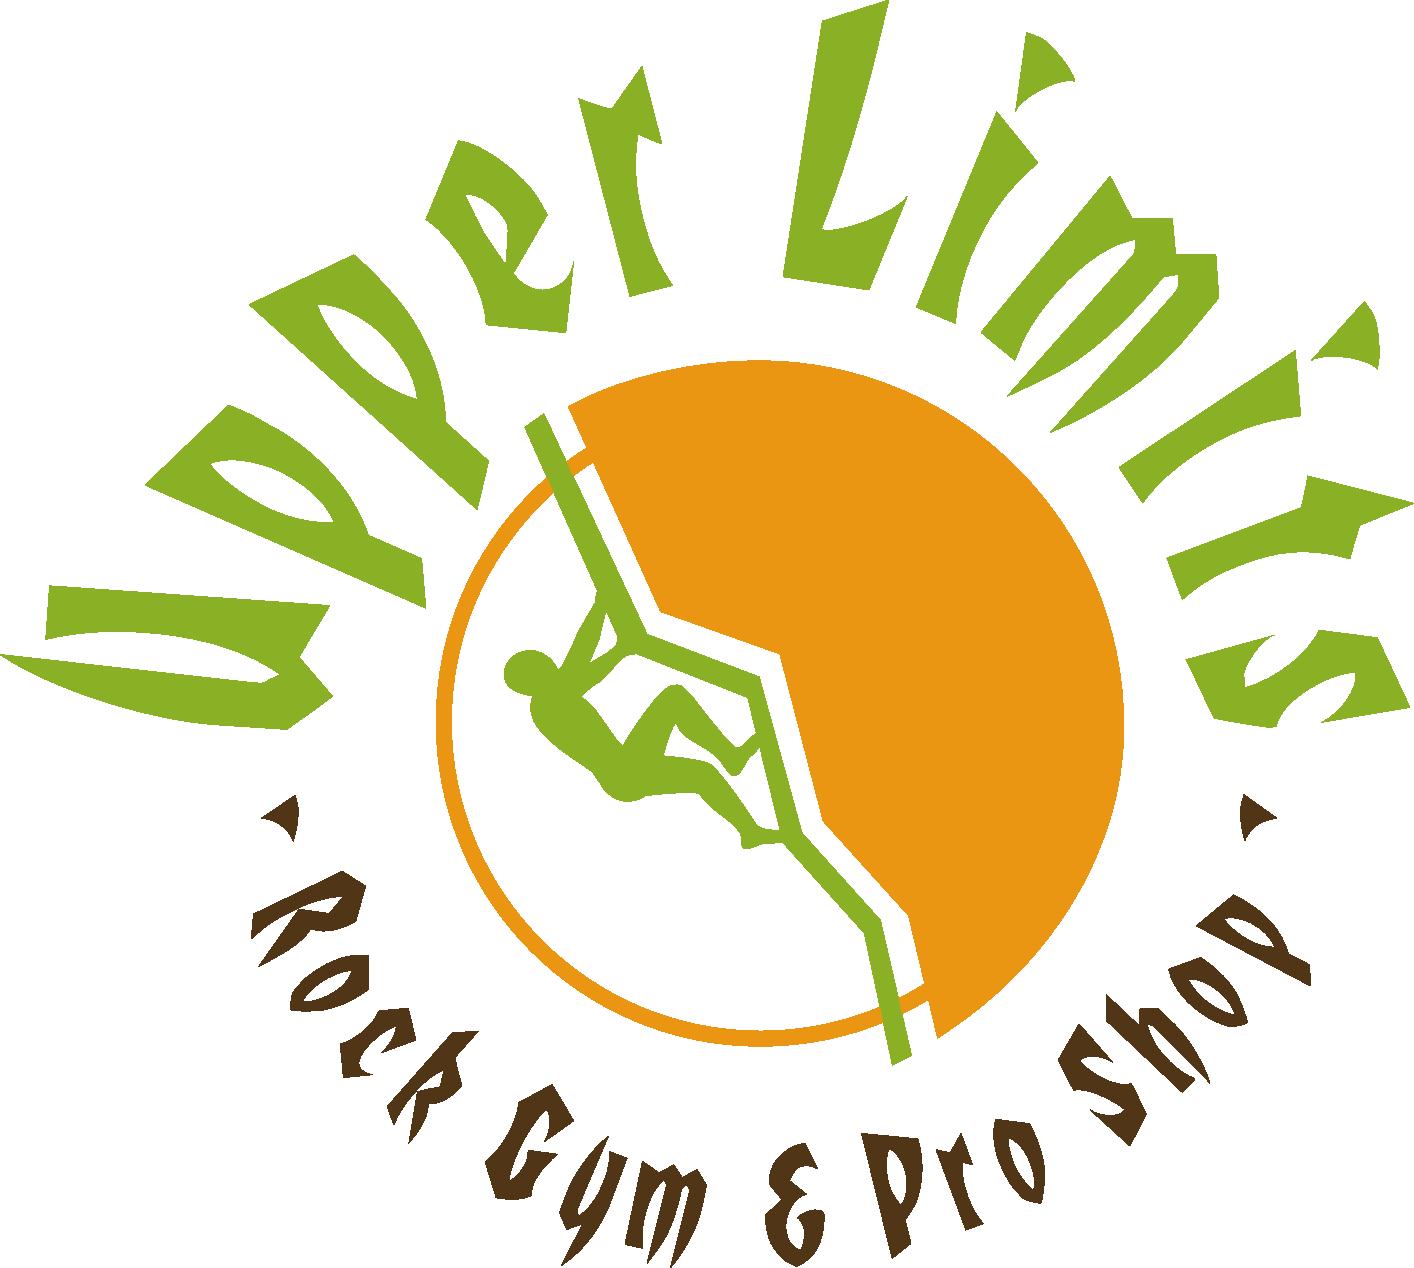 Upper Limits Climbing Gym